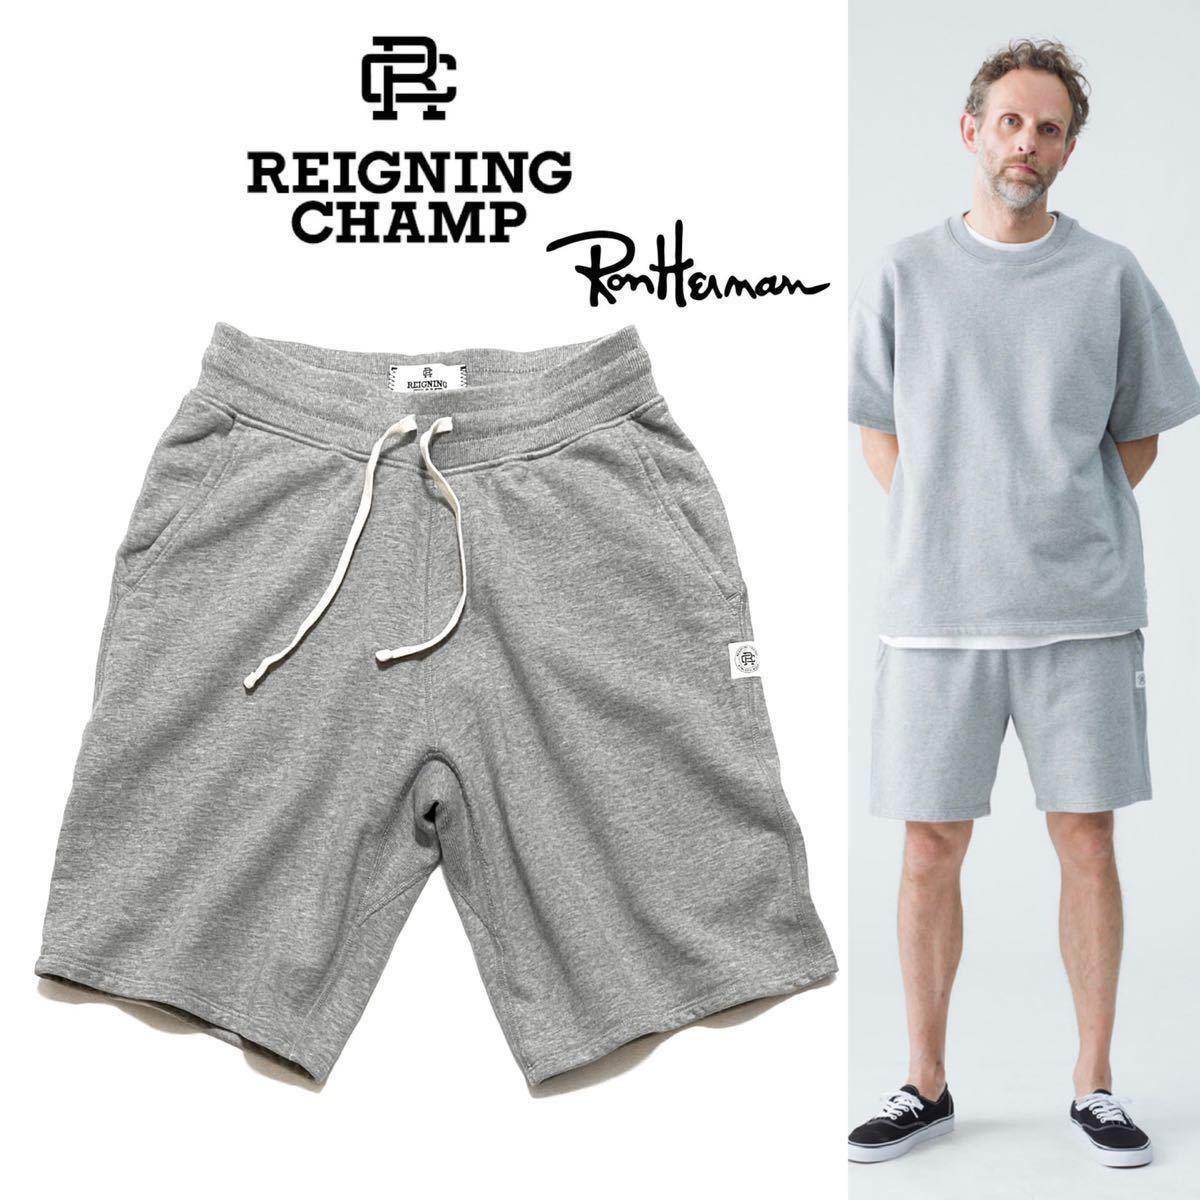 【REIGNING CHANP】最高峰のプレミアムスウェット◎レイニングチャンプ スウェットショーツ ショートパンツ スウェット ロンハーマン取扱い